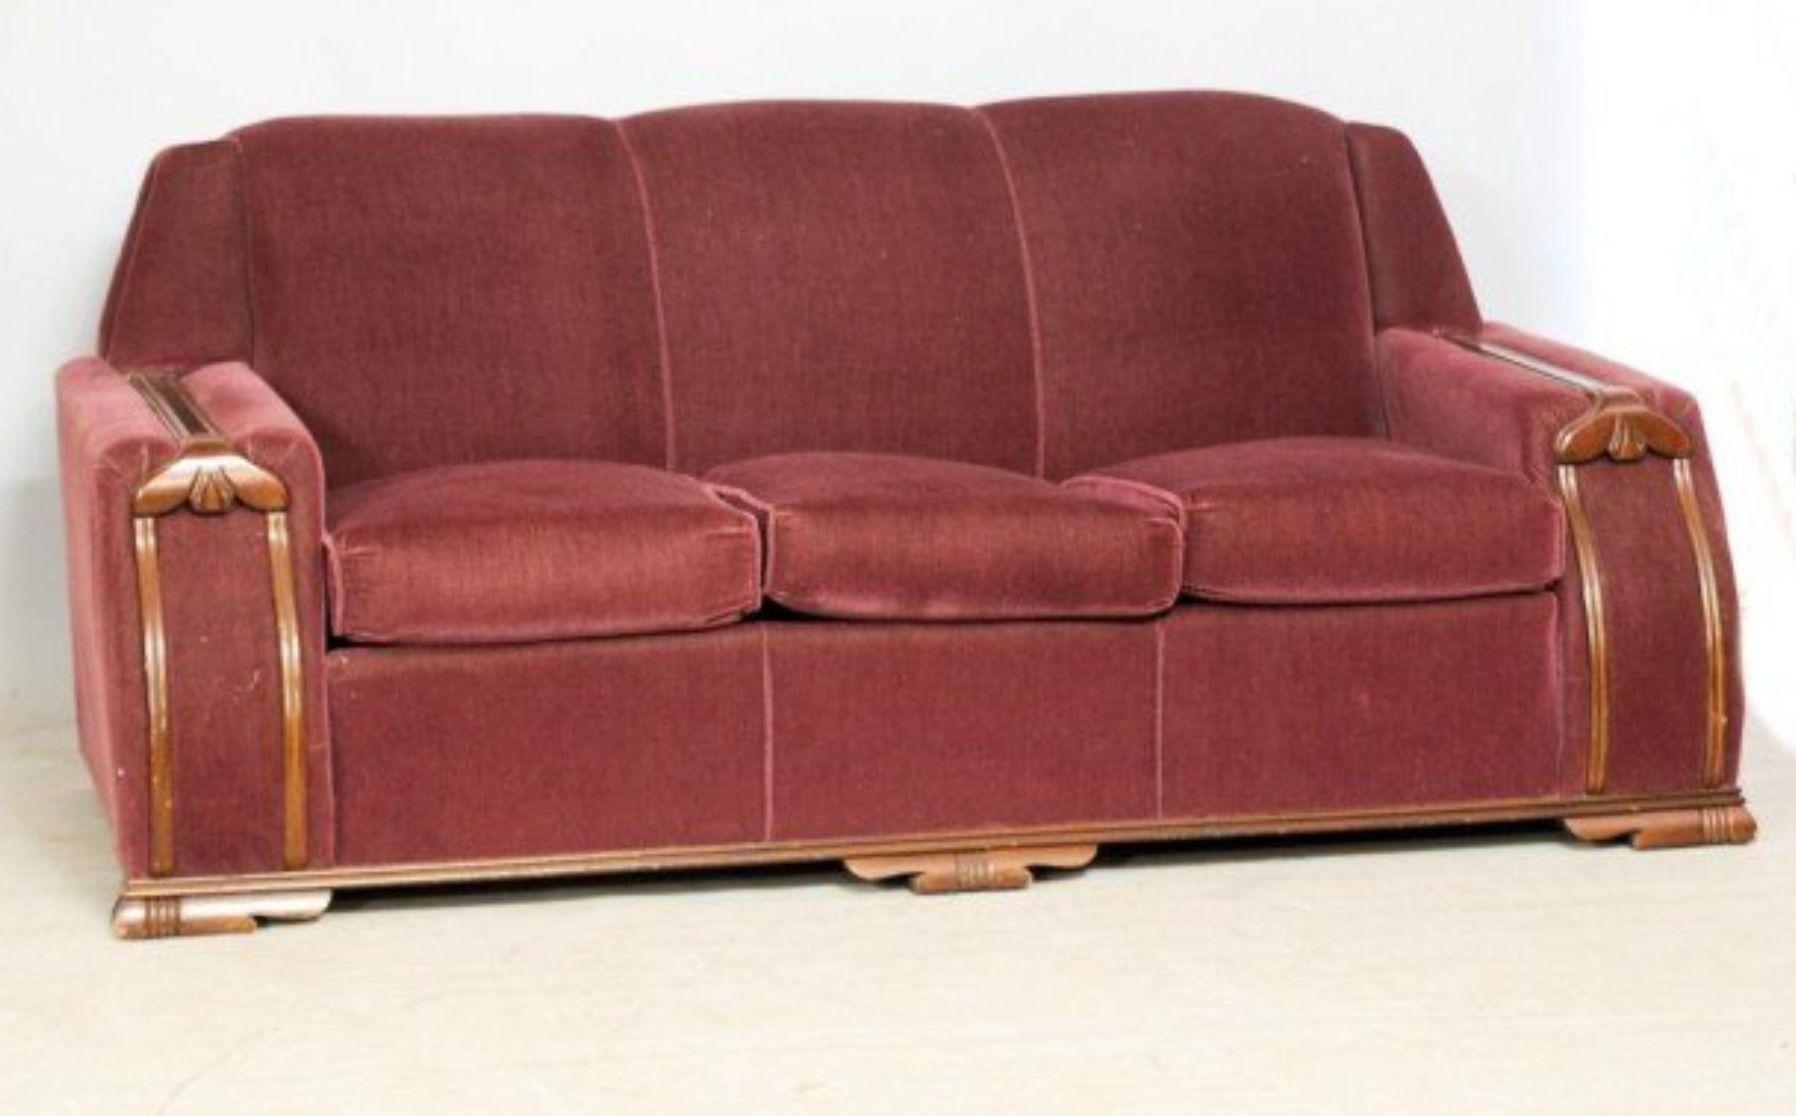 Deco Sofa See The Matching Chair Photo Art Interiors